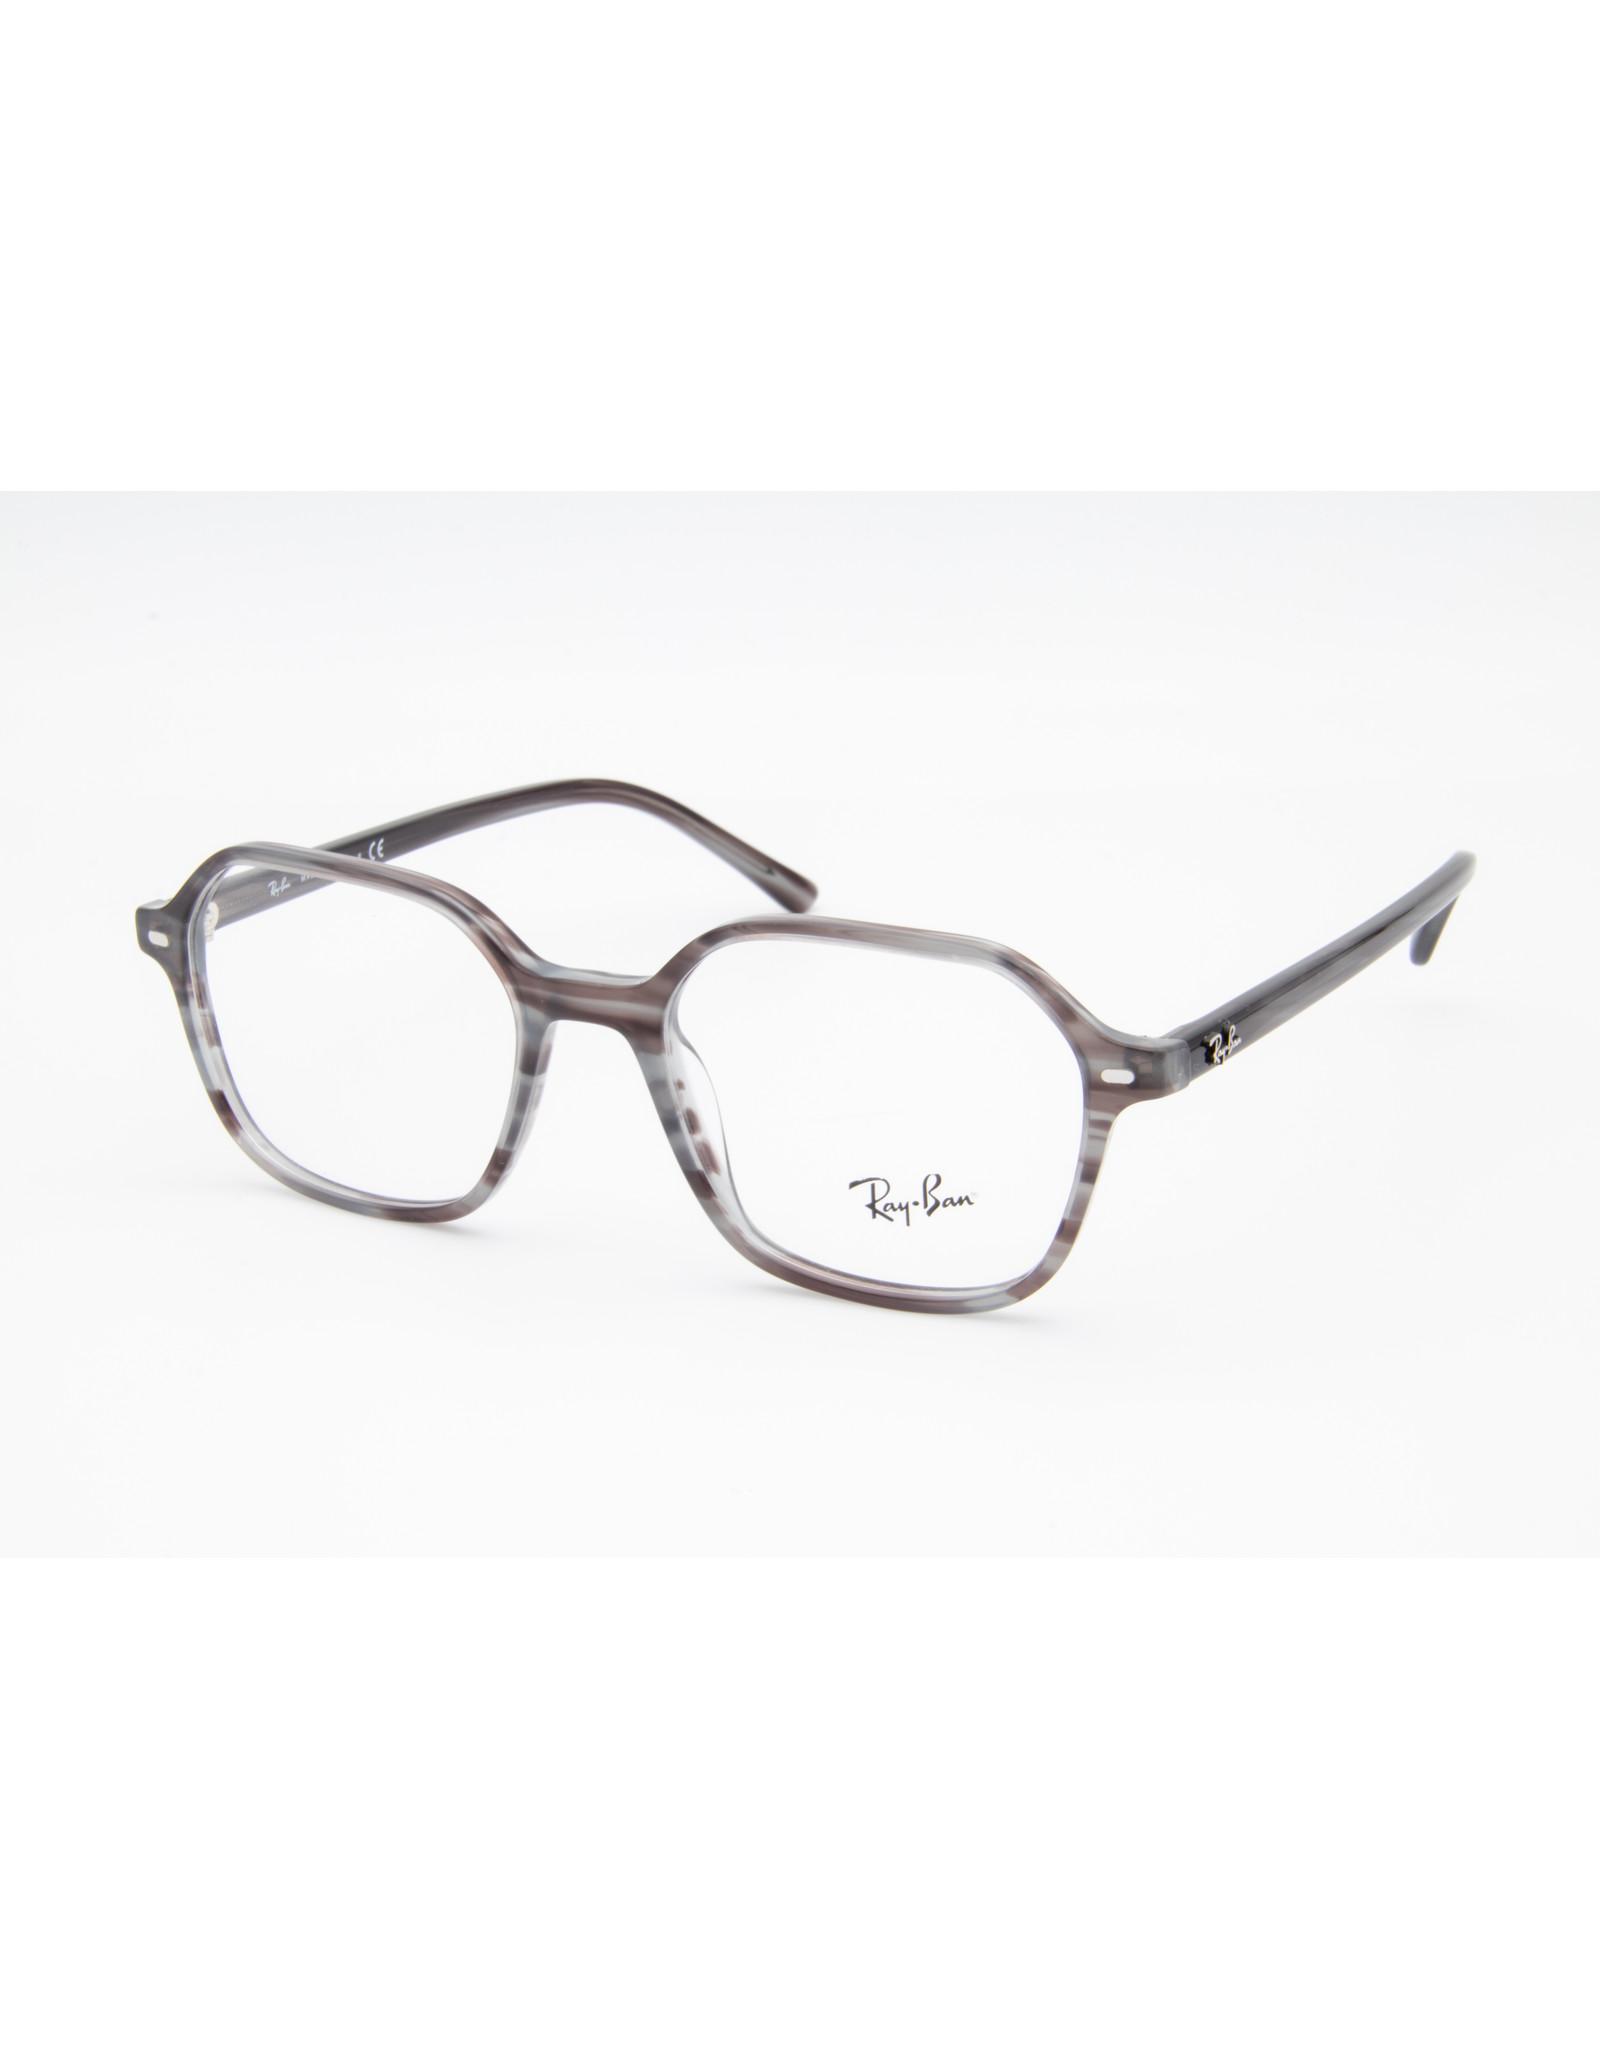 Ray-Ban Rb5394 8055 (grey)